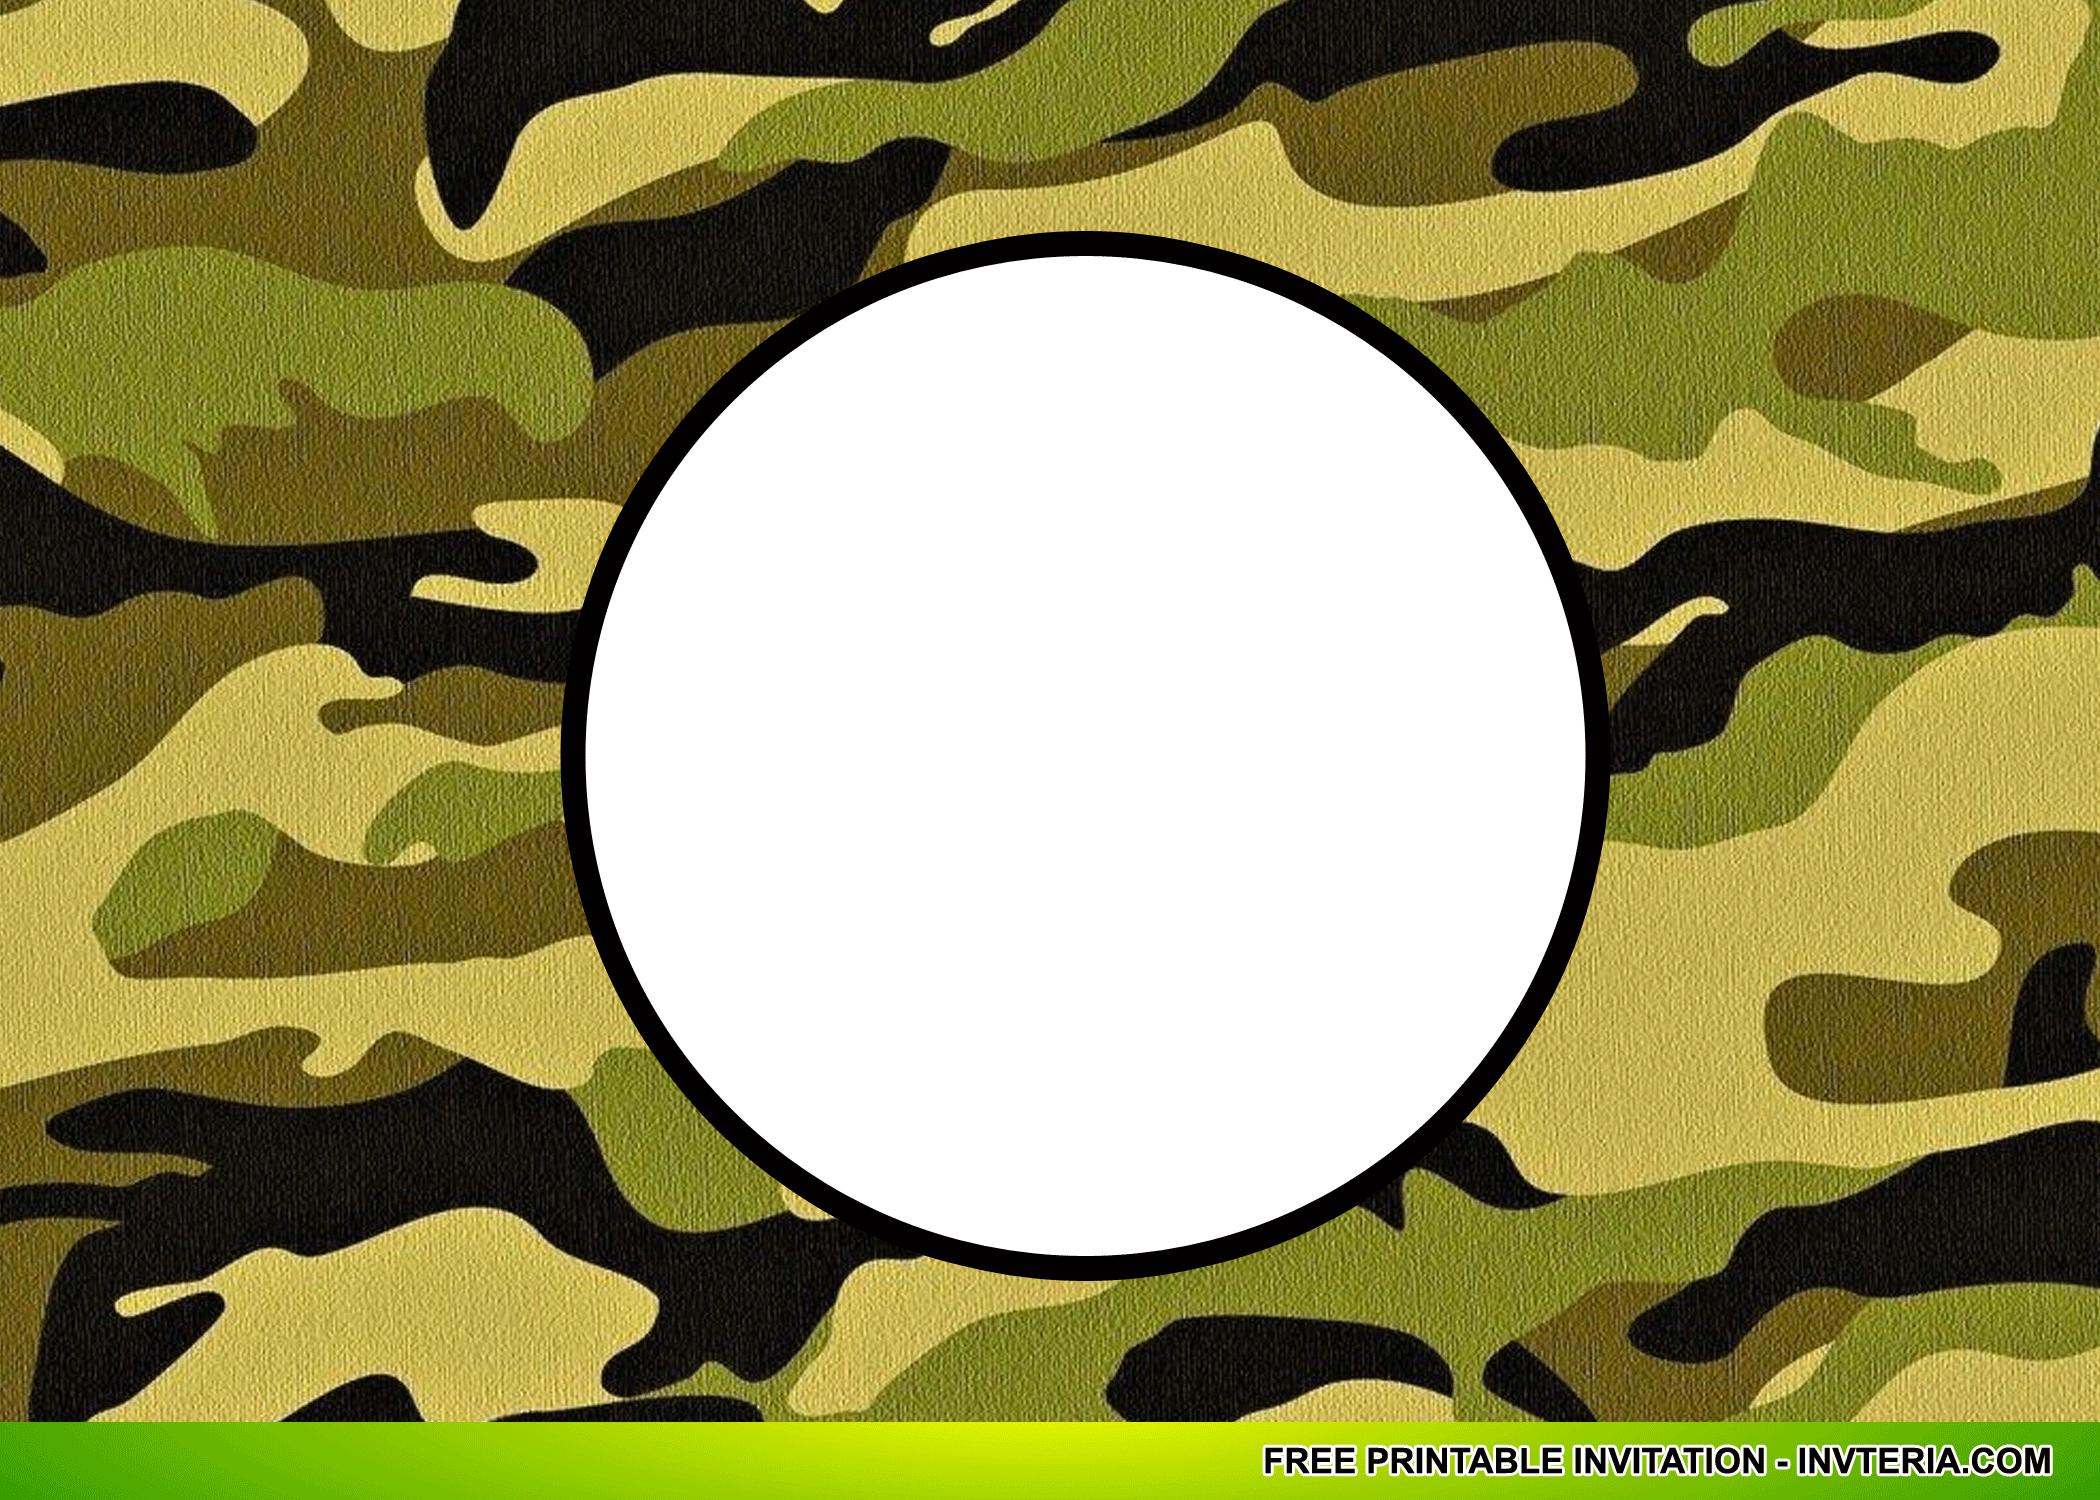 Cool Best Free Printable Camo Birthday Invitations Idea | Invitation - Free Printable Camouflage Invitations